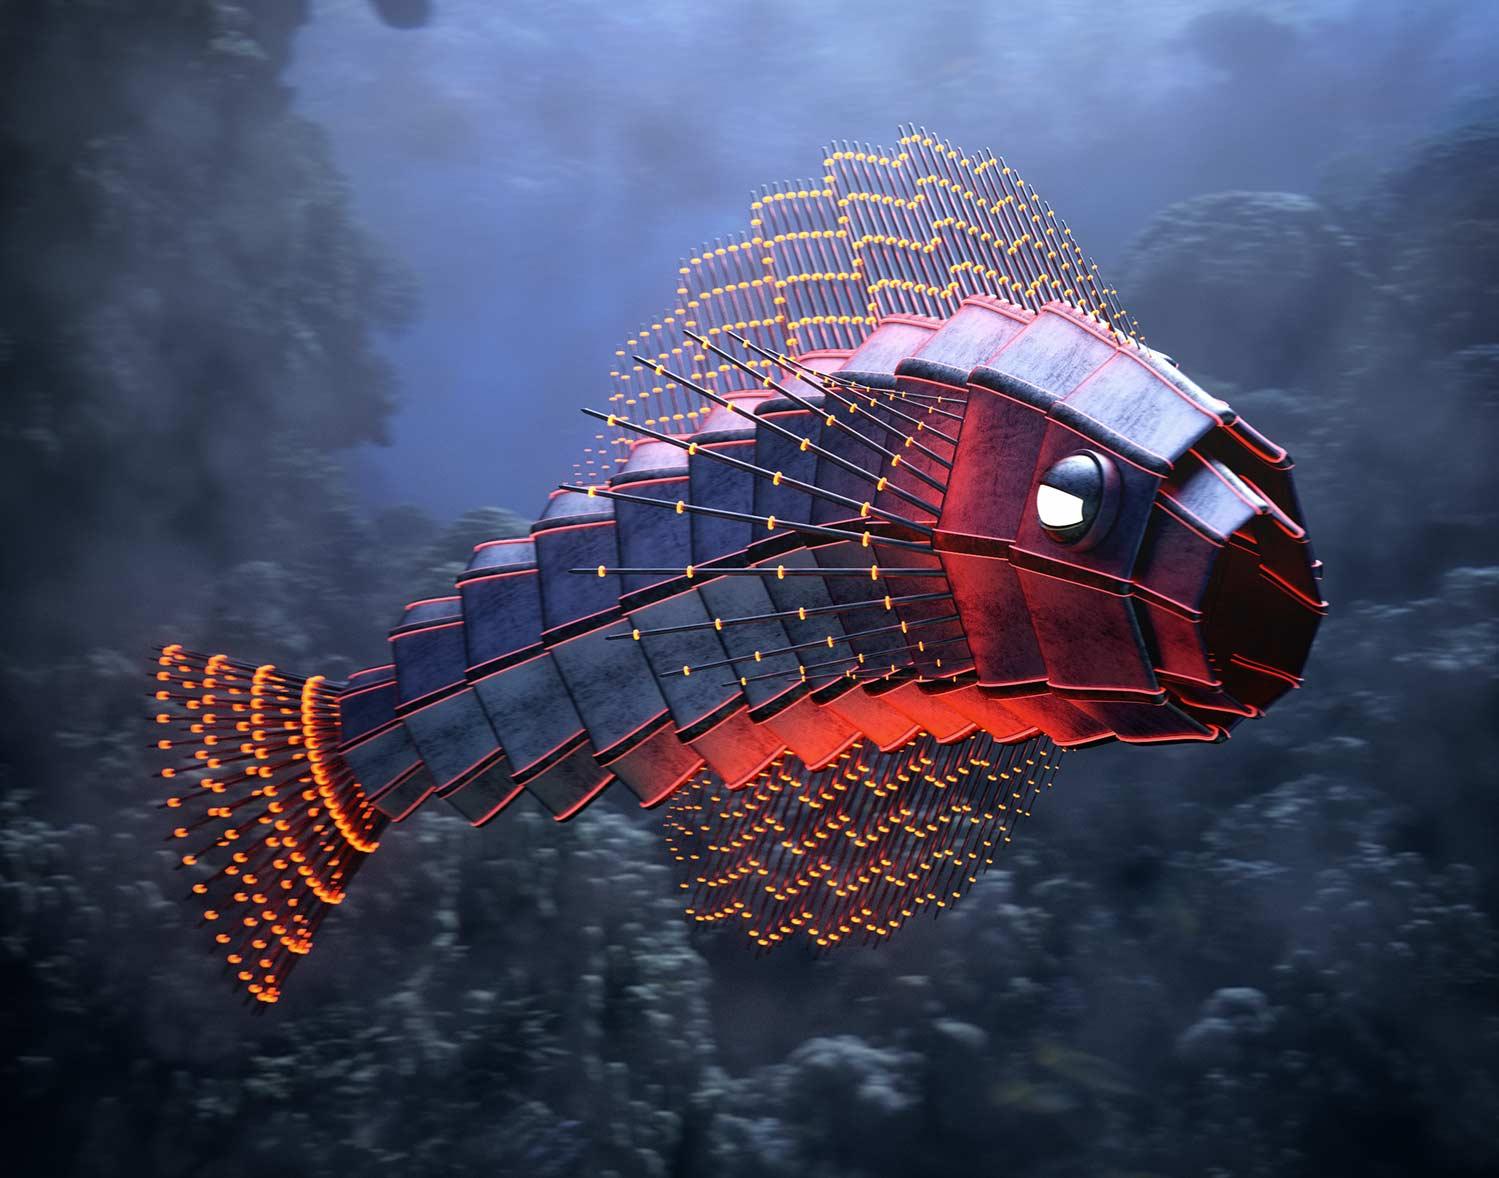 Fishbot print